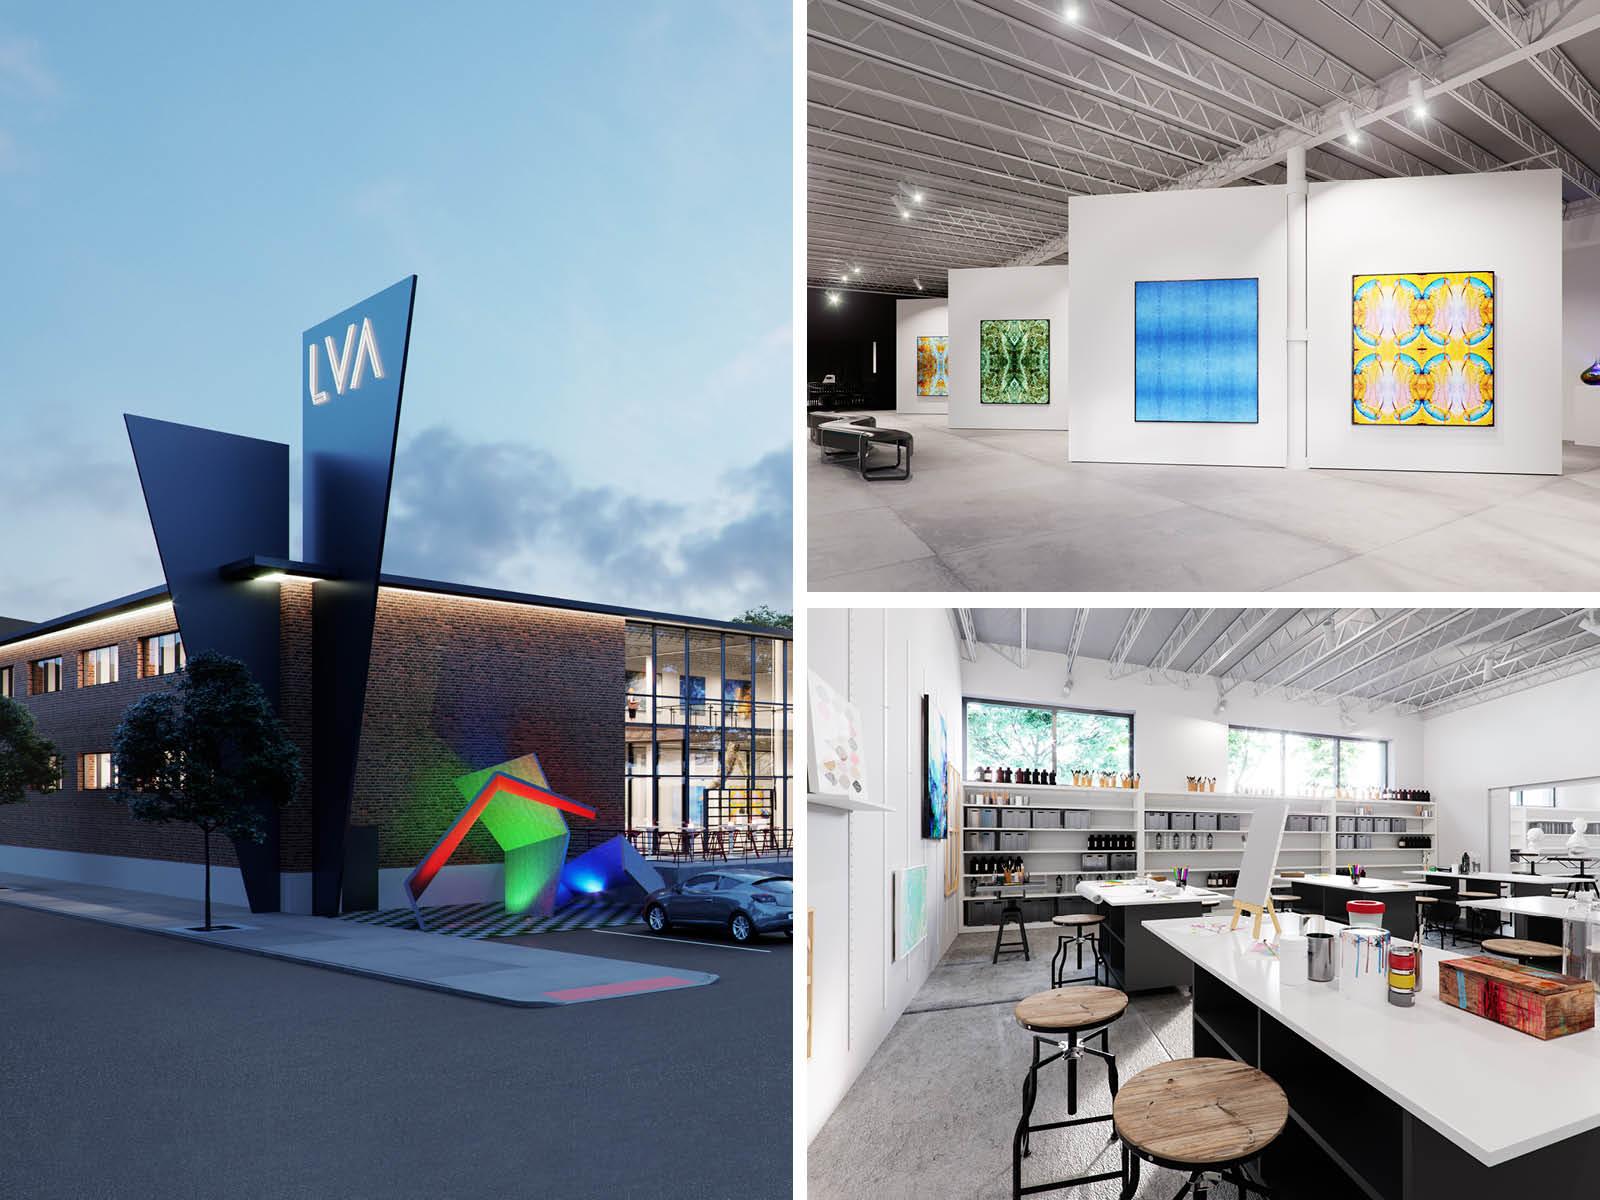 louisville-visual-art-gallery-classroom